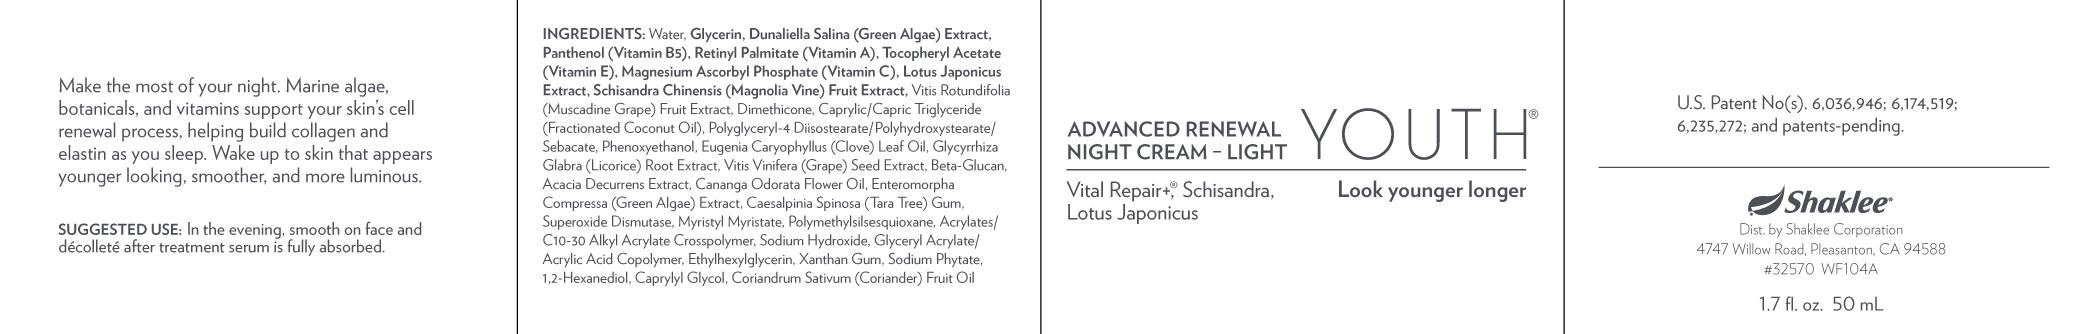 Advanced Renewal Night Cream- Light